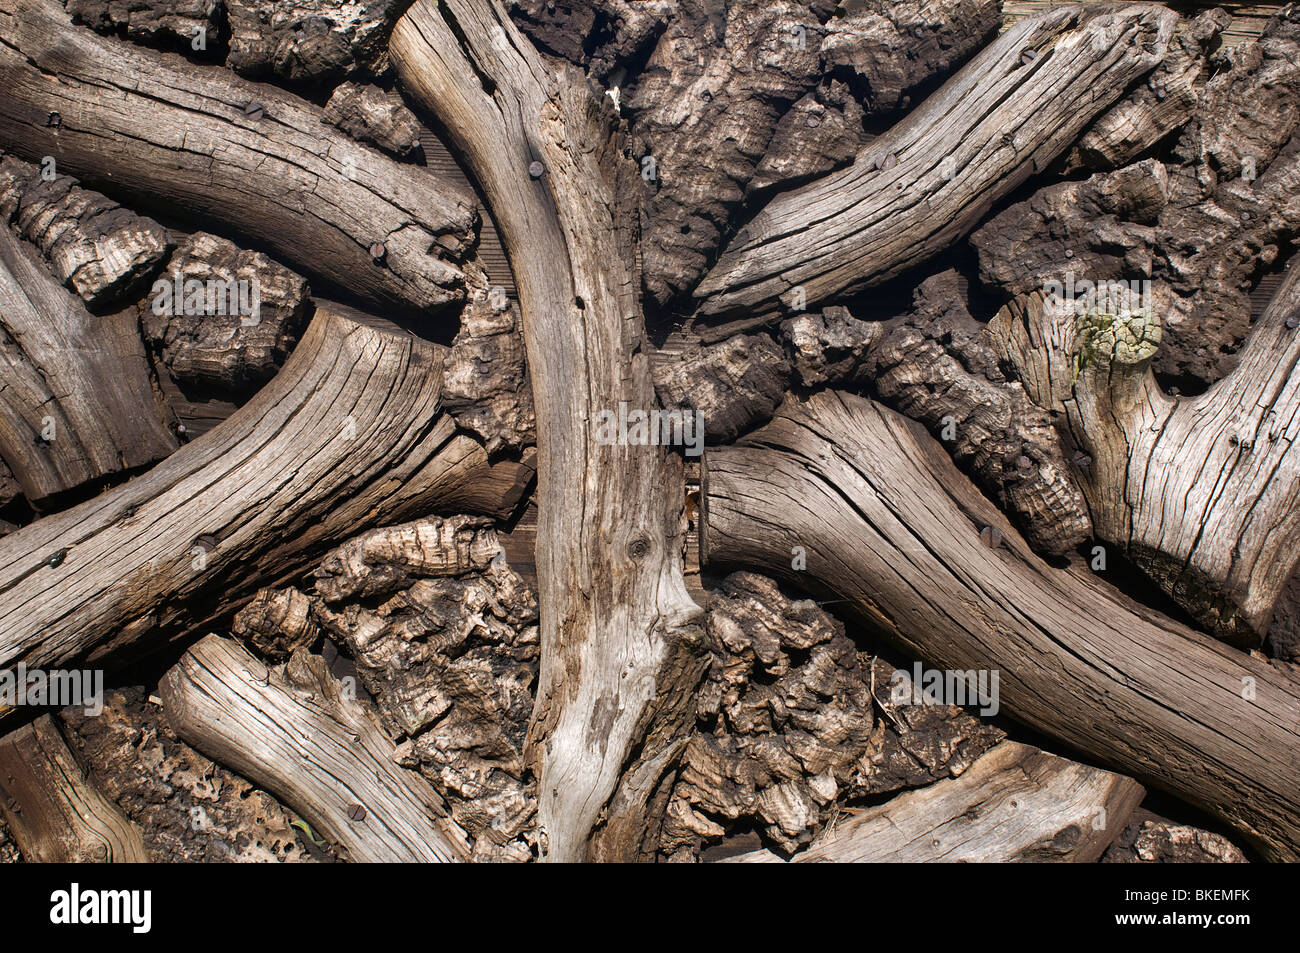 Patrón de madera Imagen De Stock